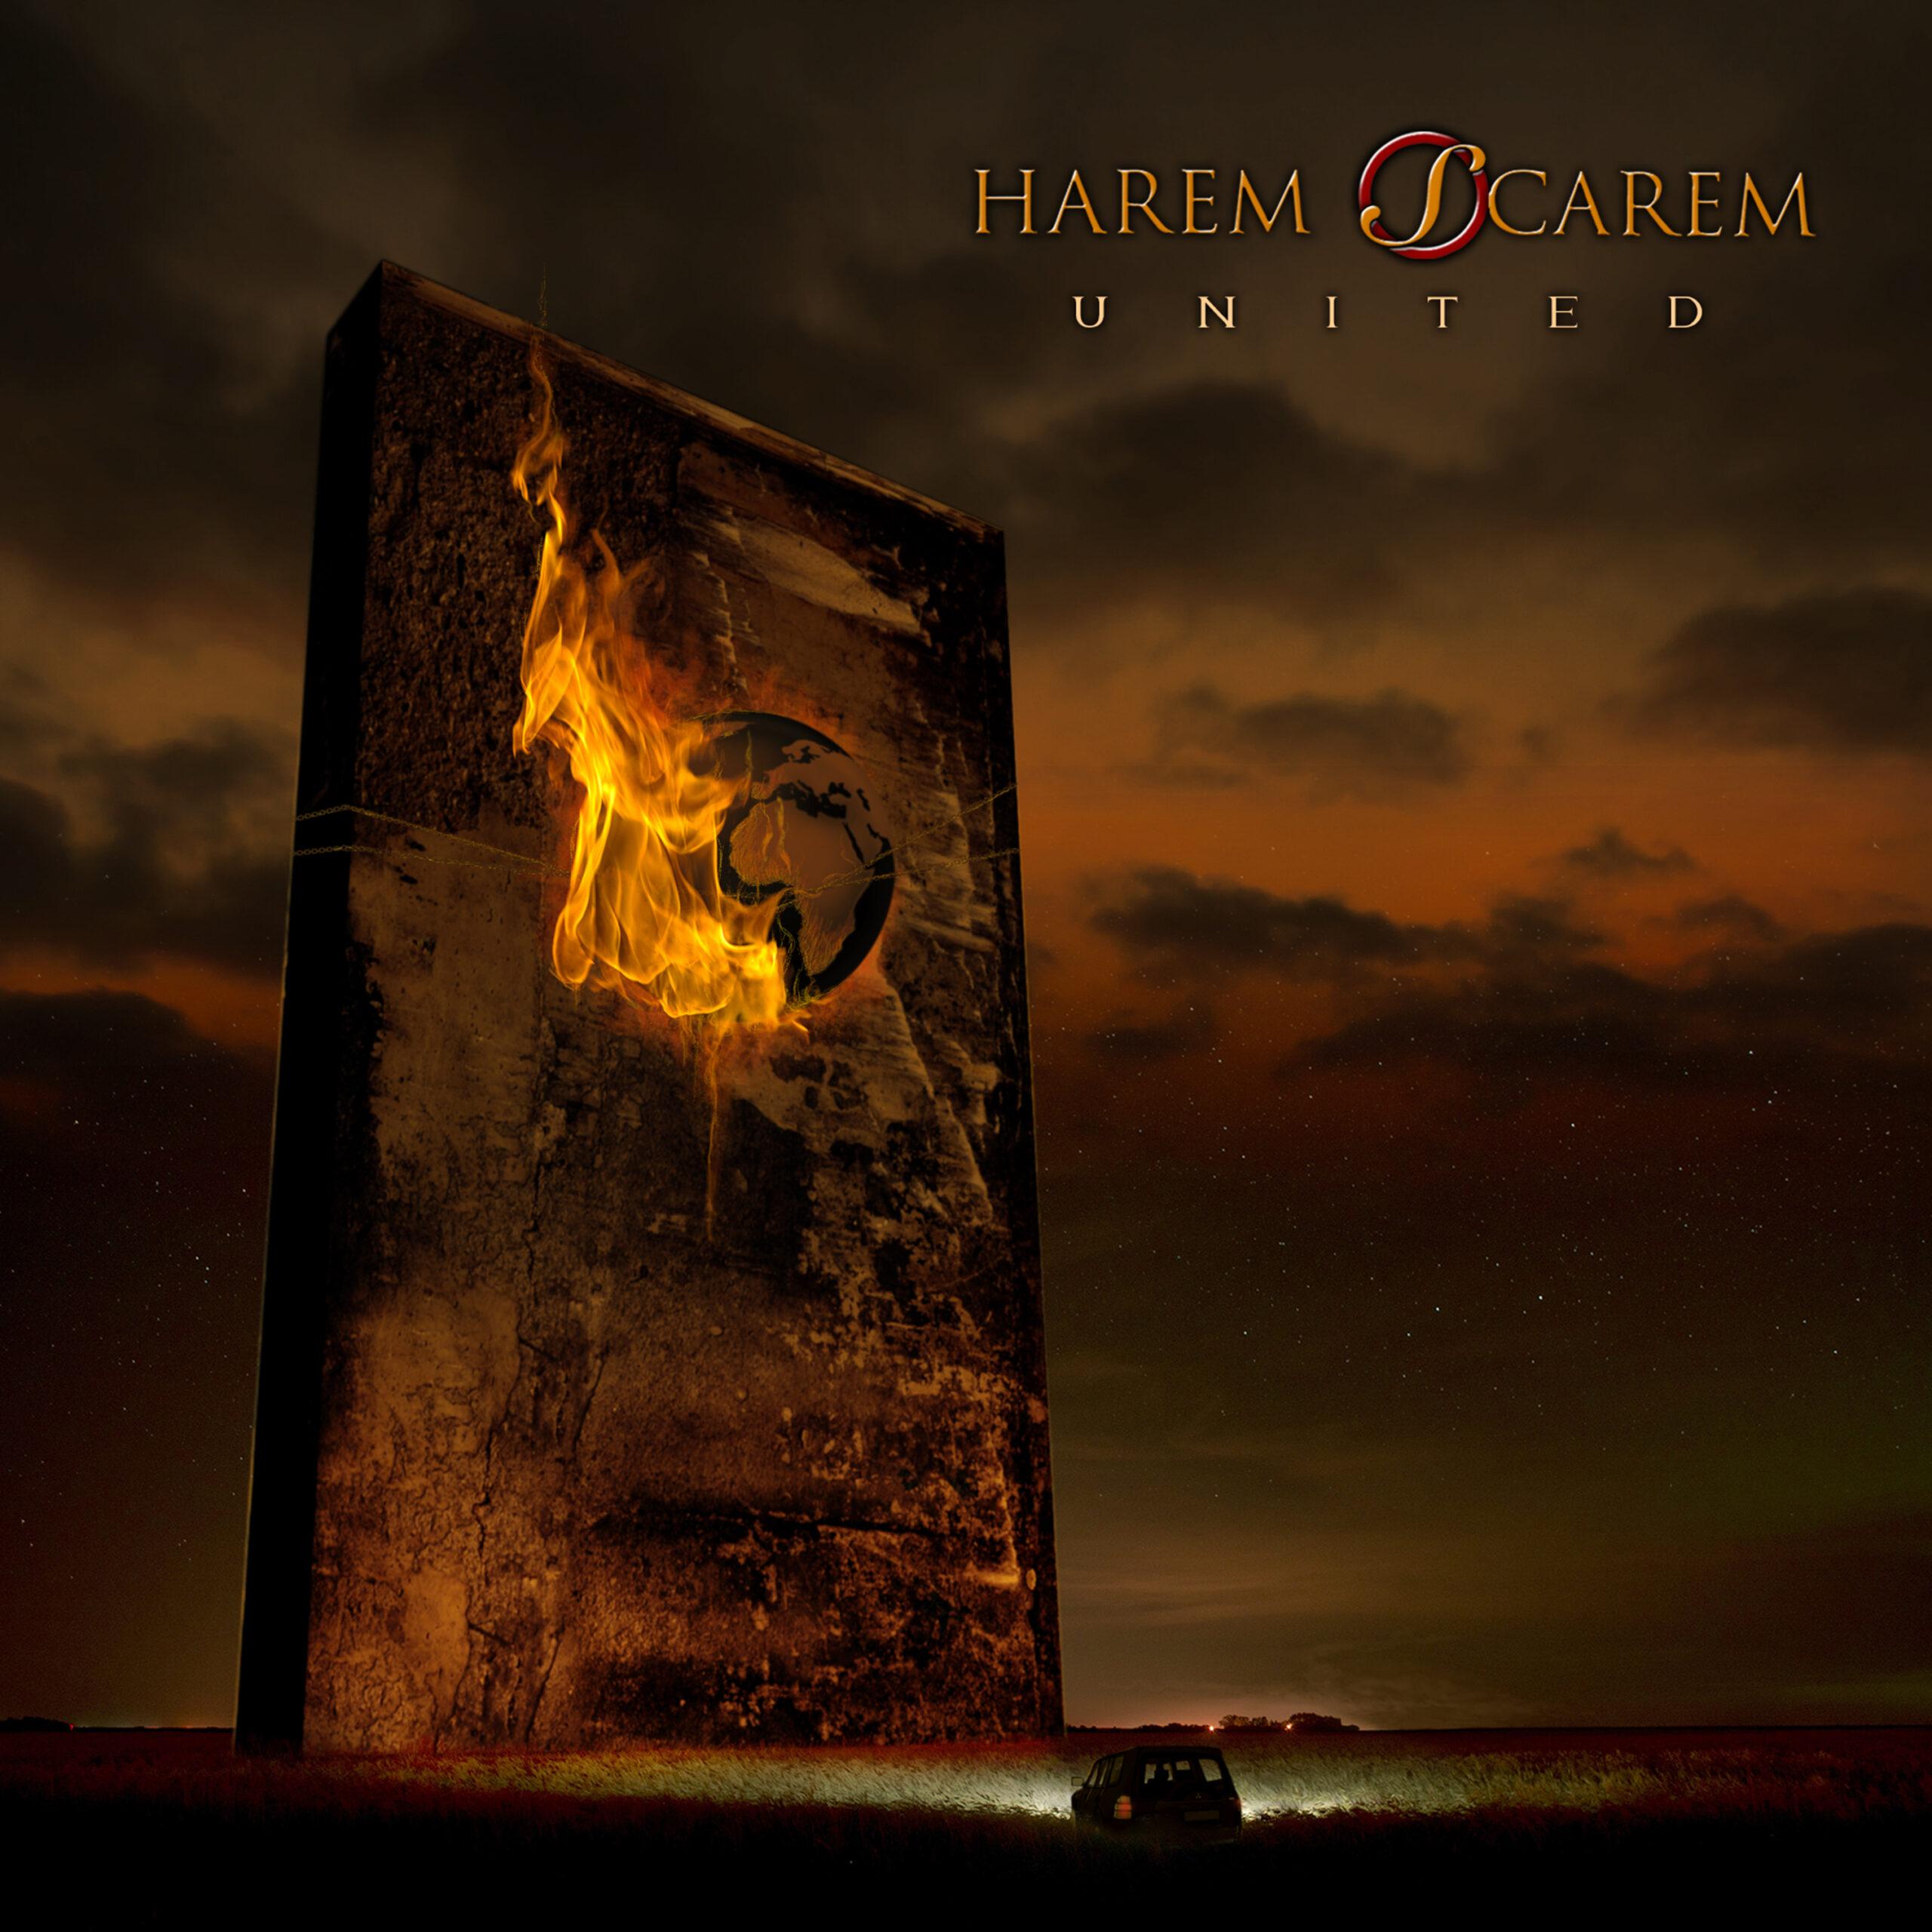 HAREM SCAREM United COVER HI 3000